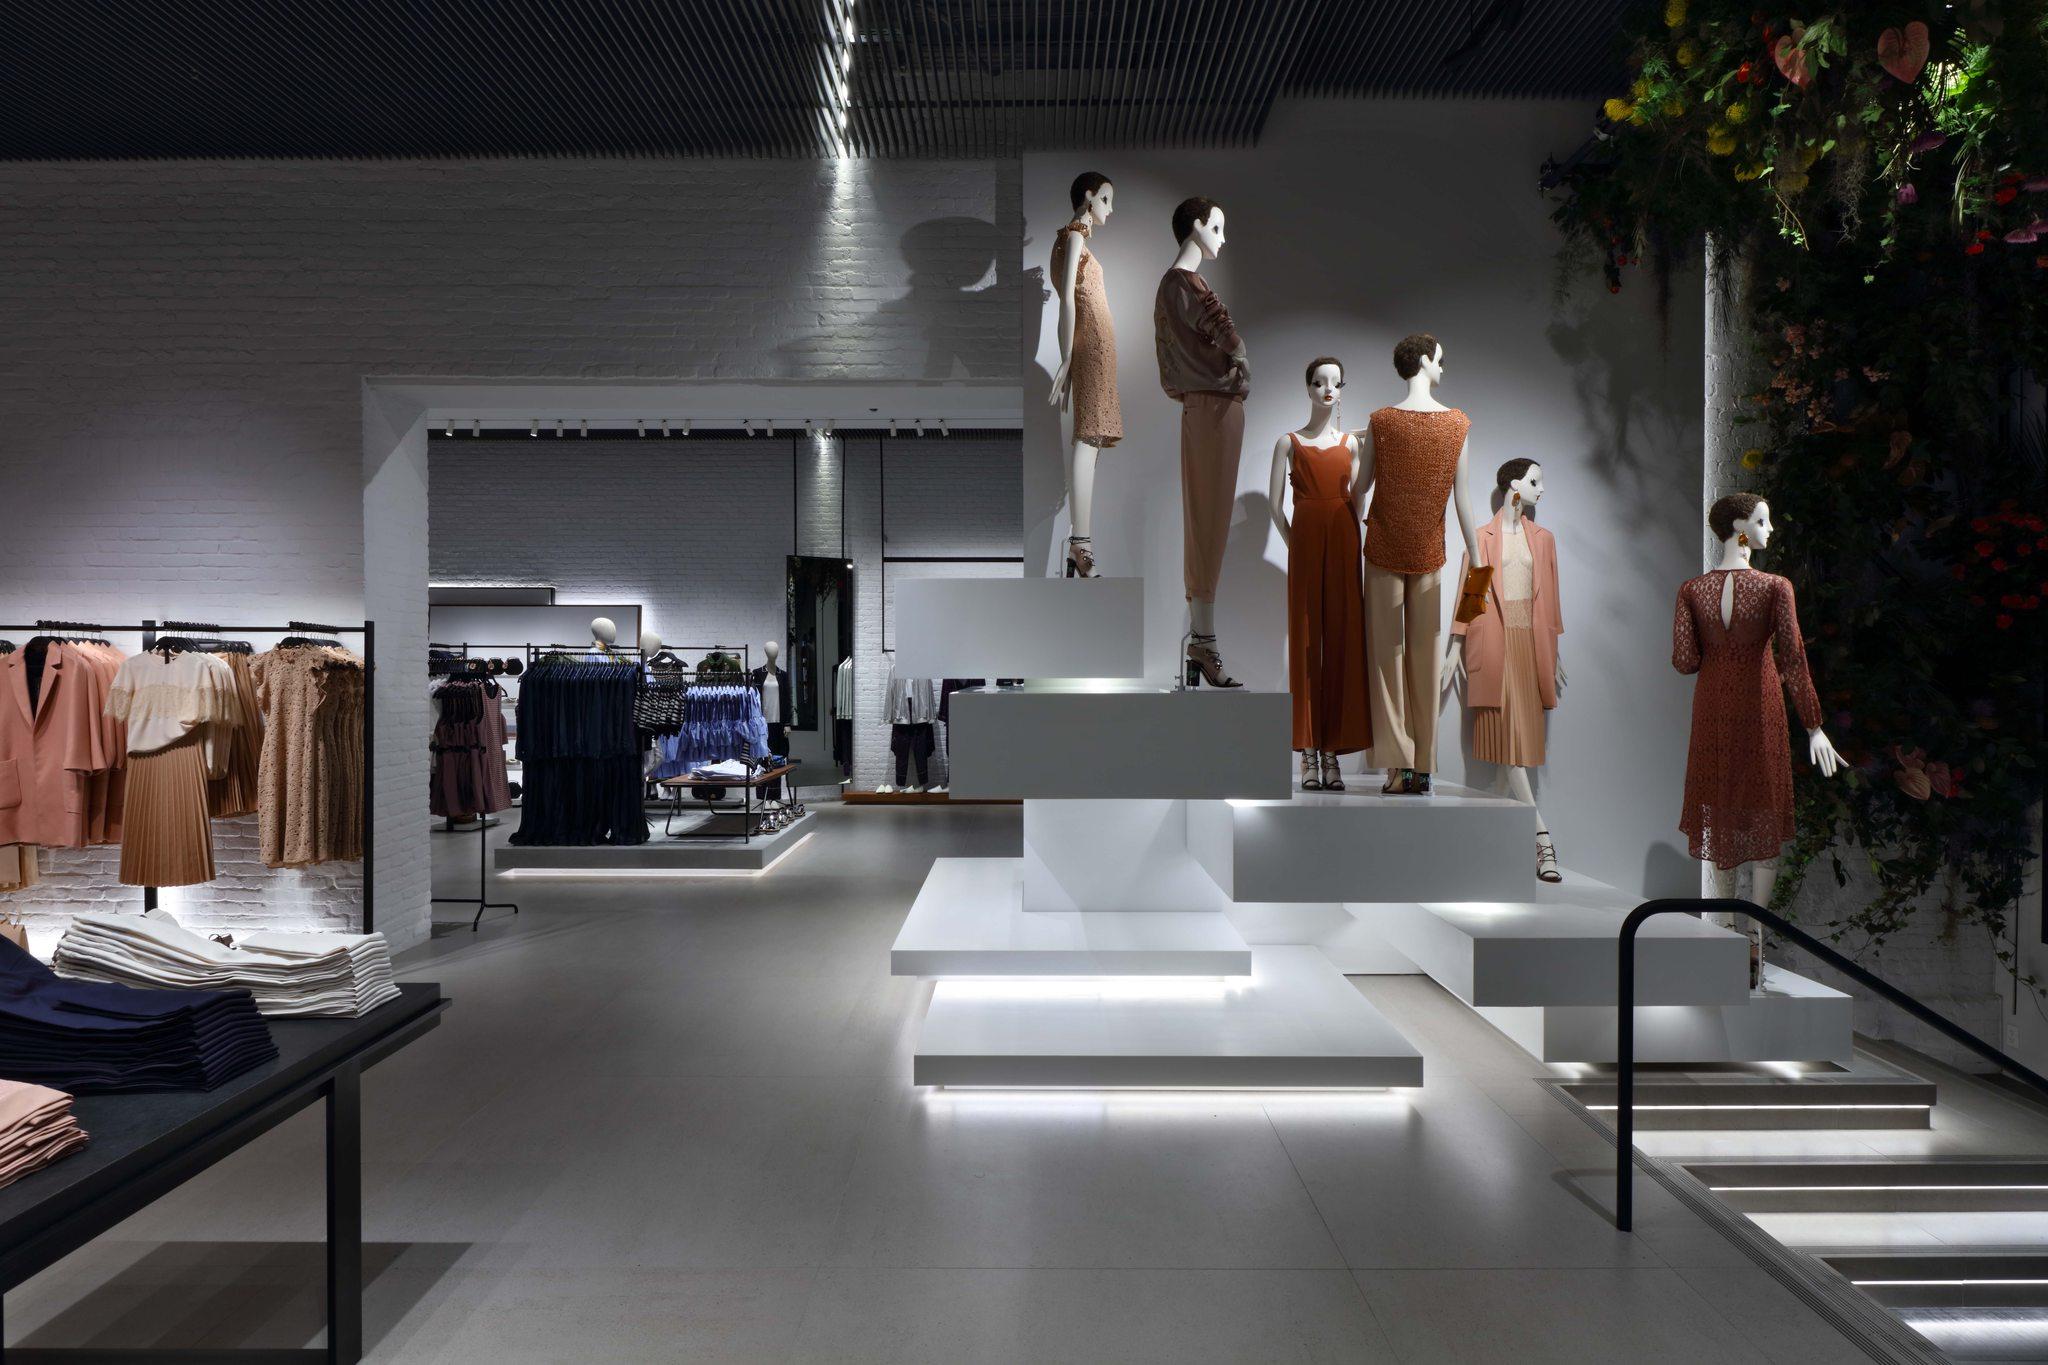 New york fashions store 22